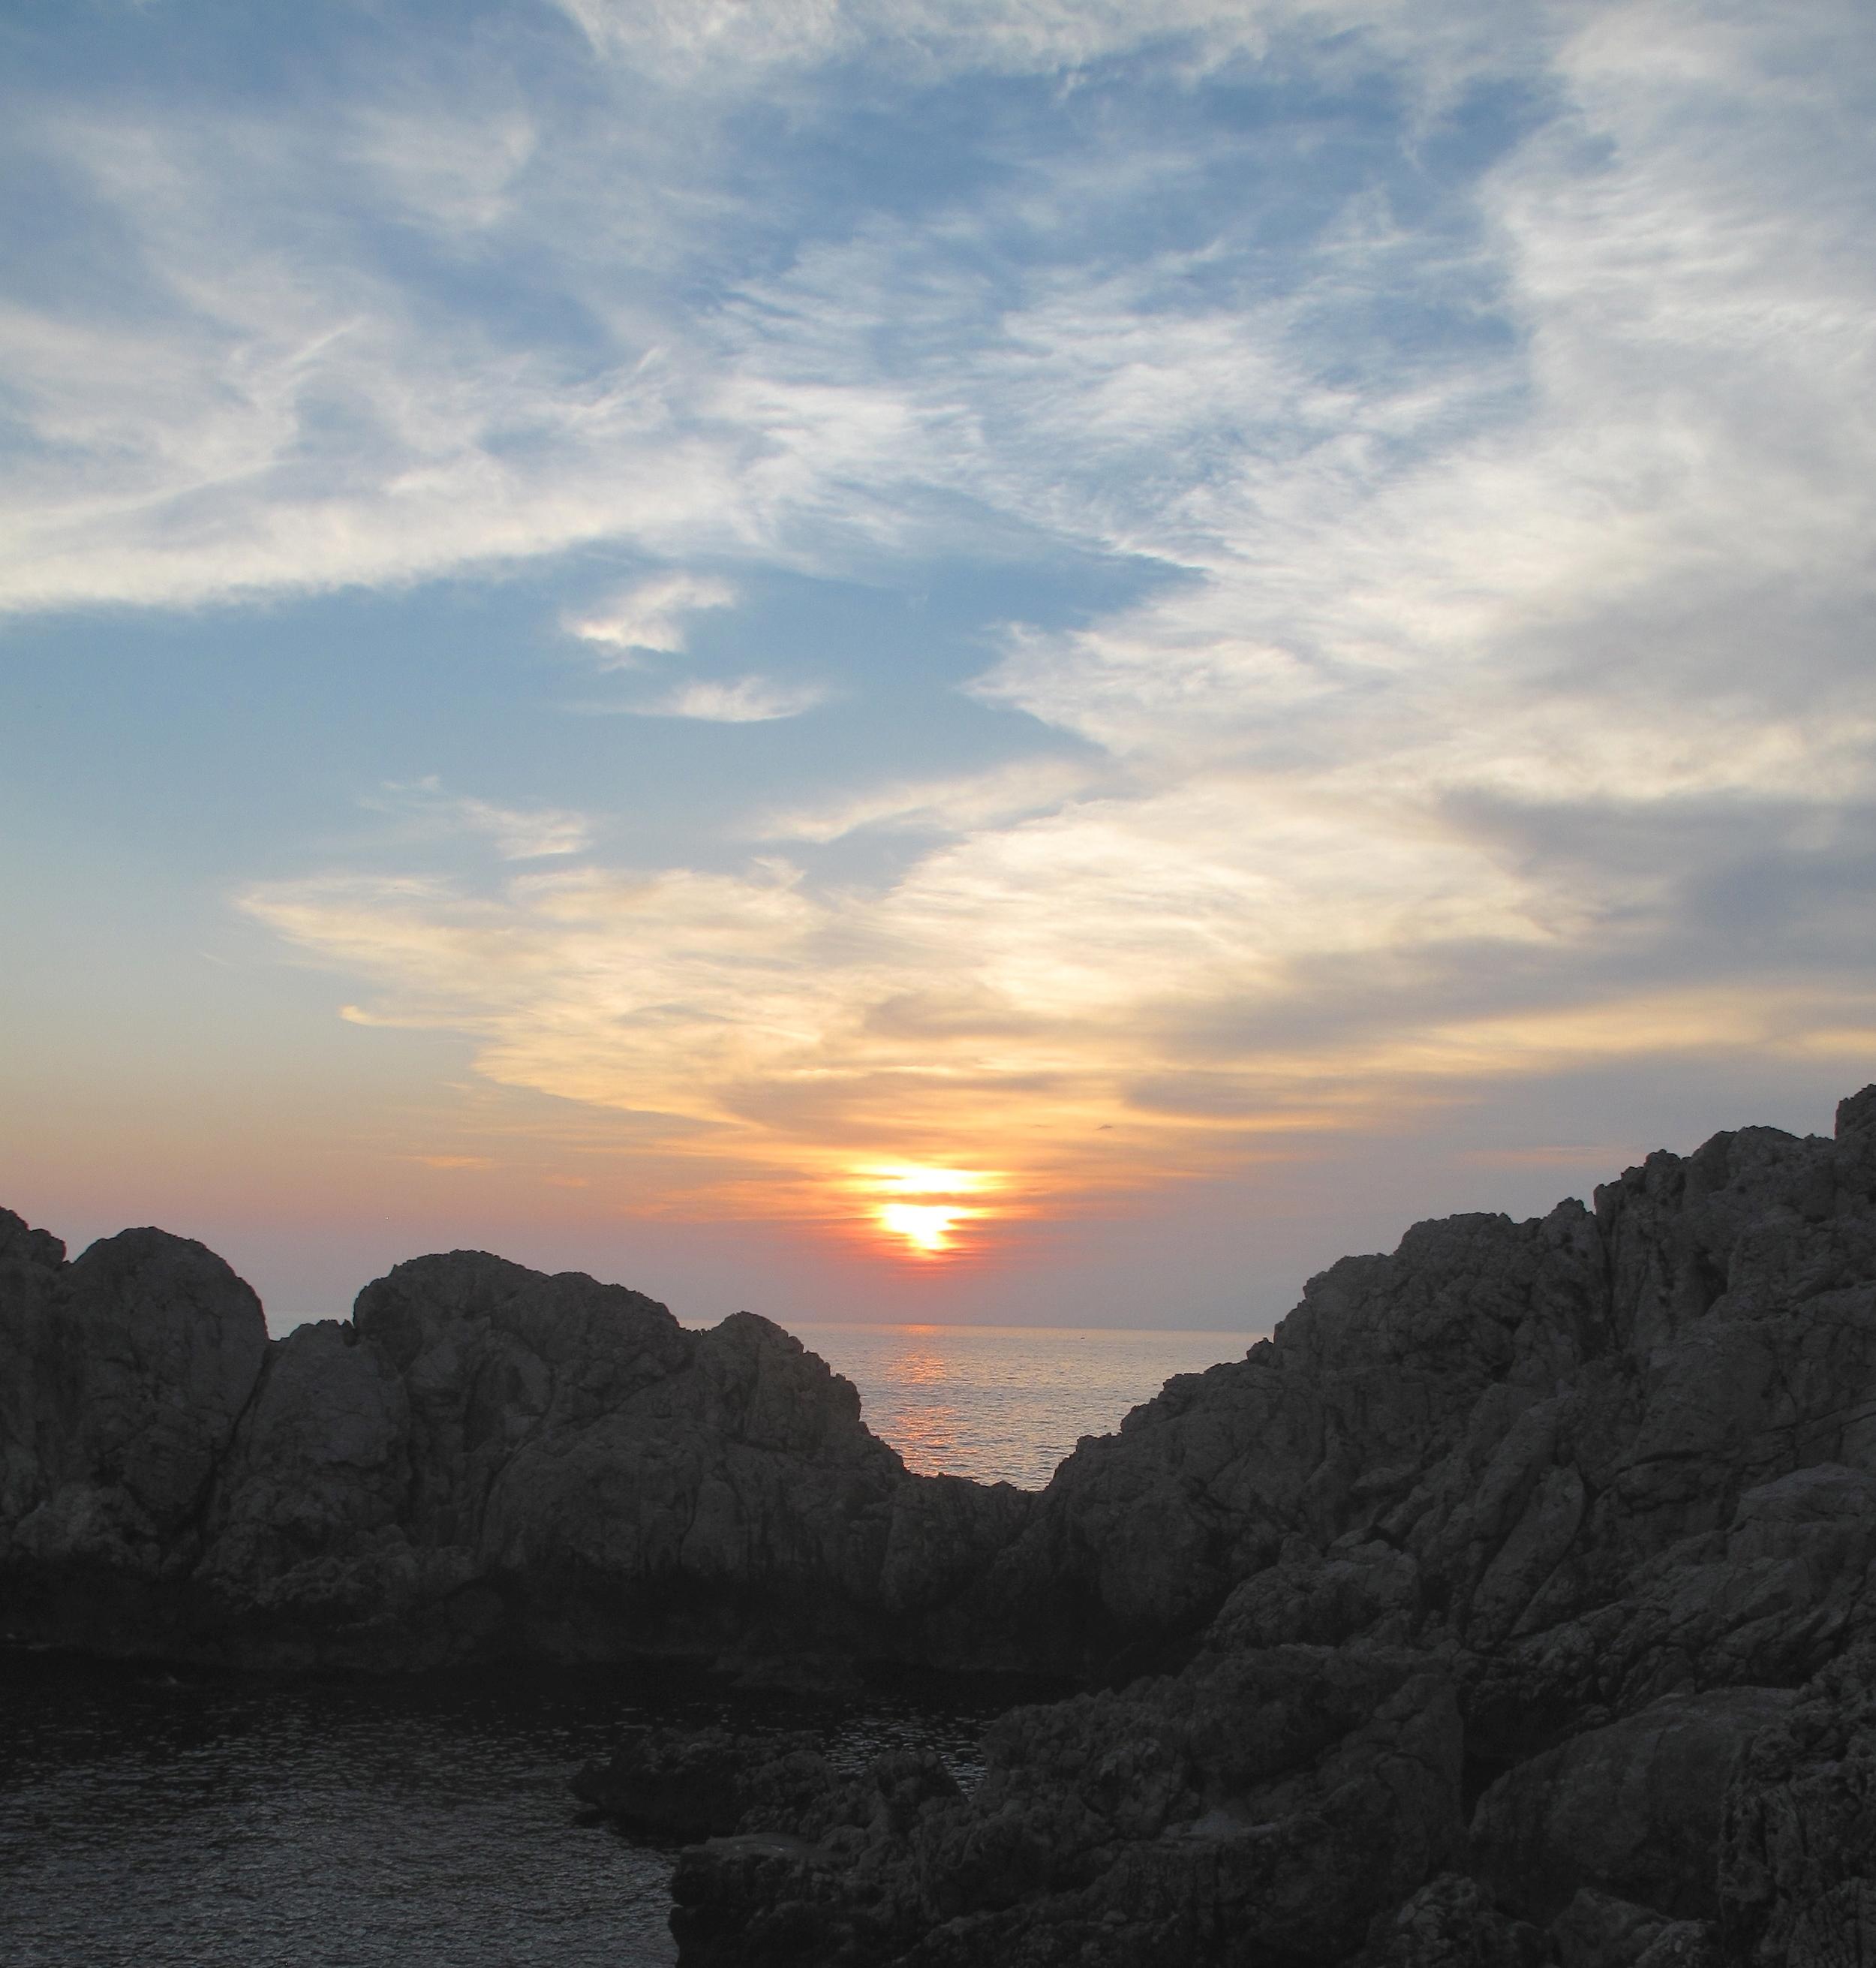 Sunset over Capri rocks